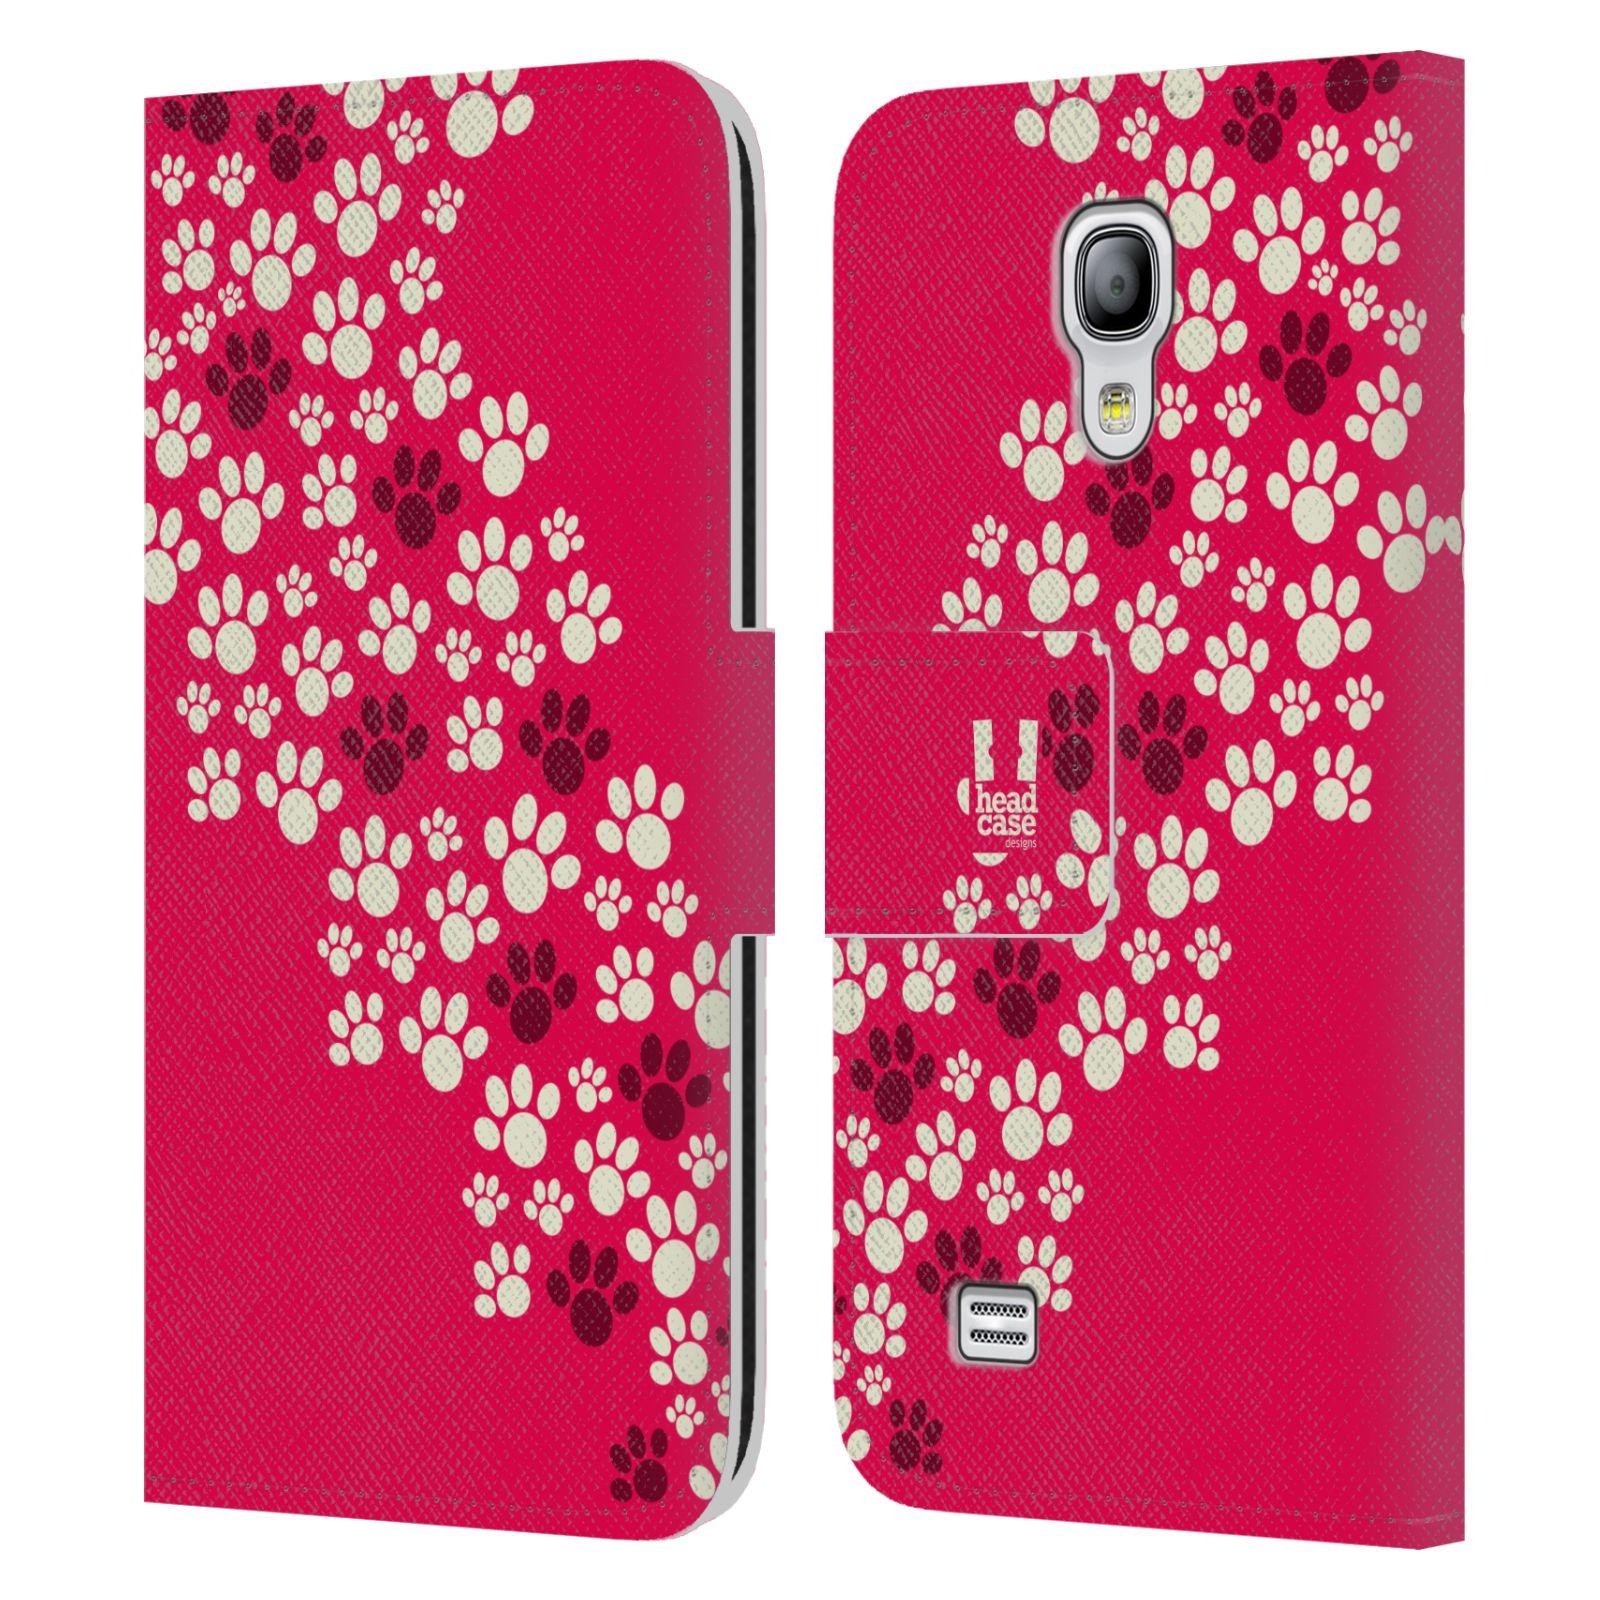 HEAD CASE Flipové pouzdro pro mobil Samsung Galaxy S4 MINI / S4 MINI DUOS Pejsek ťapky růžová barva